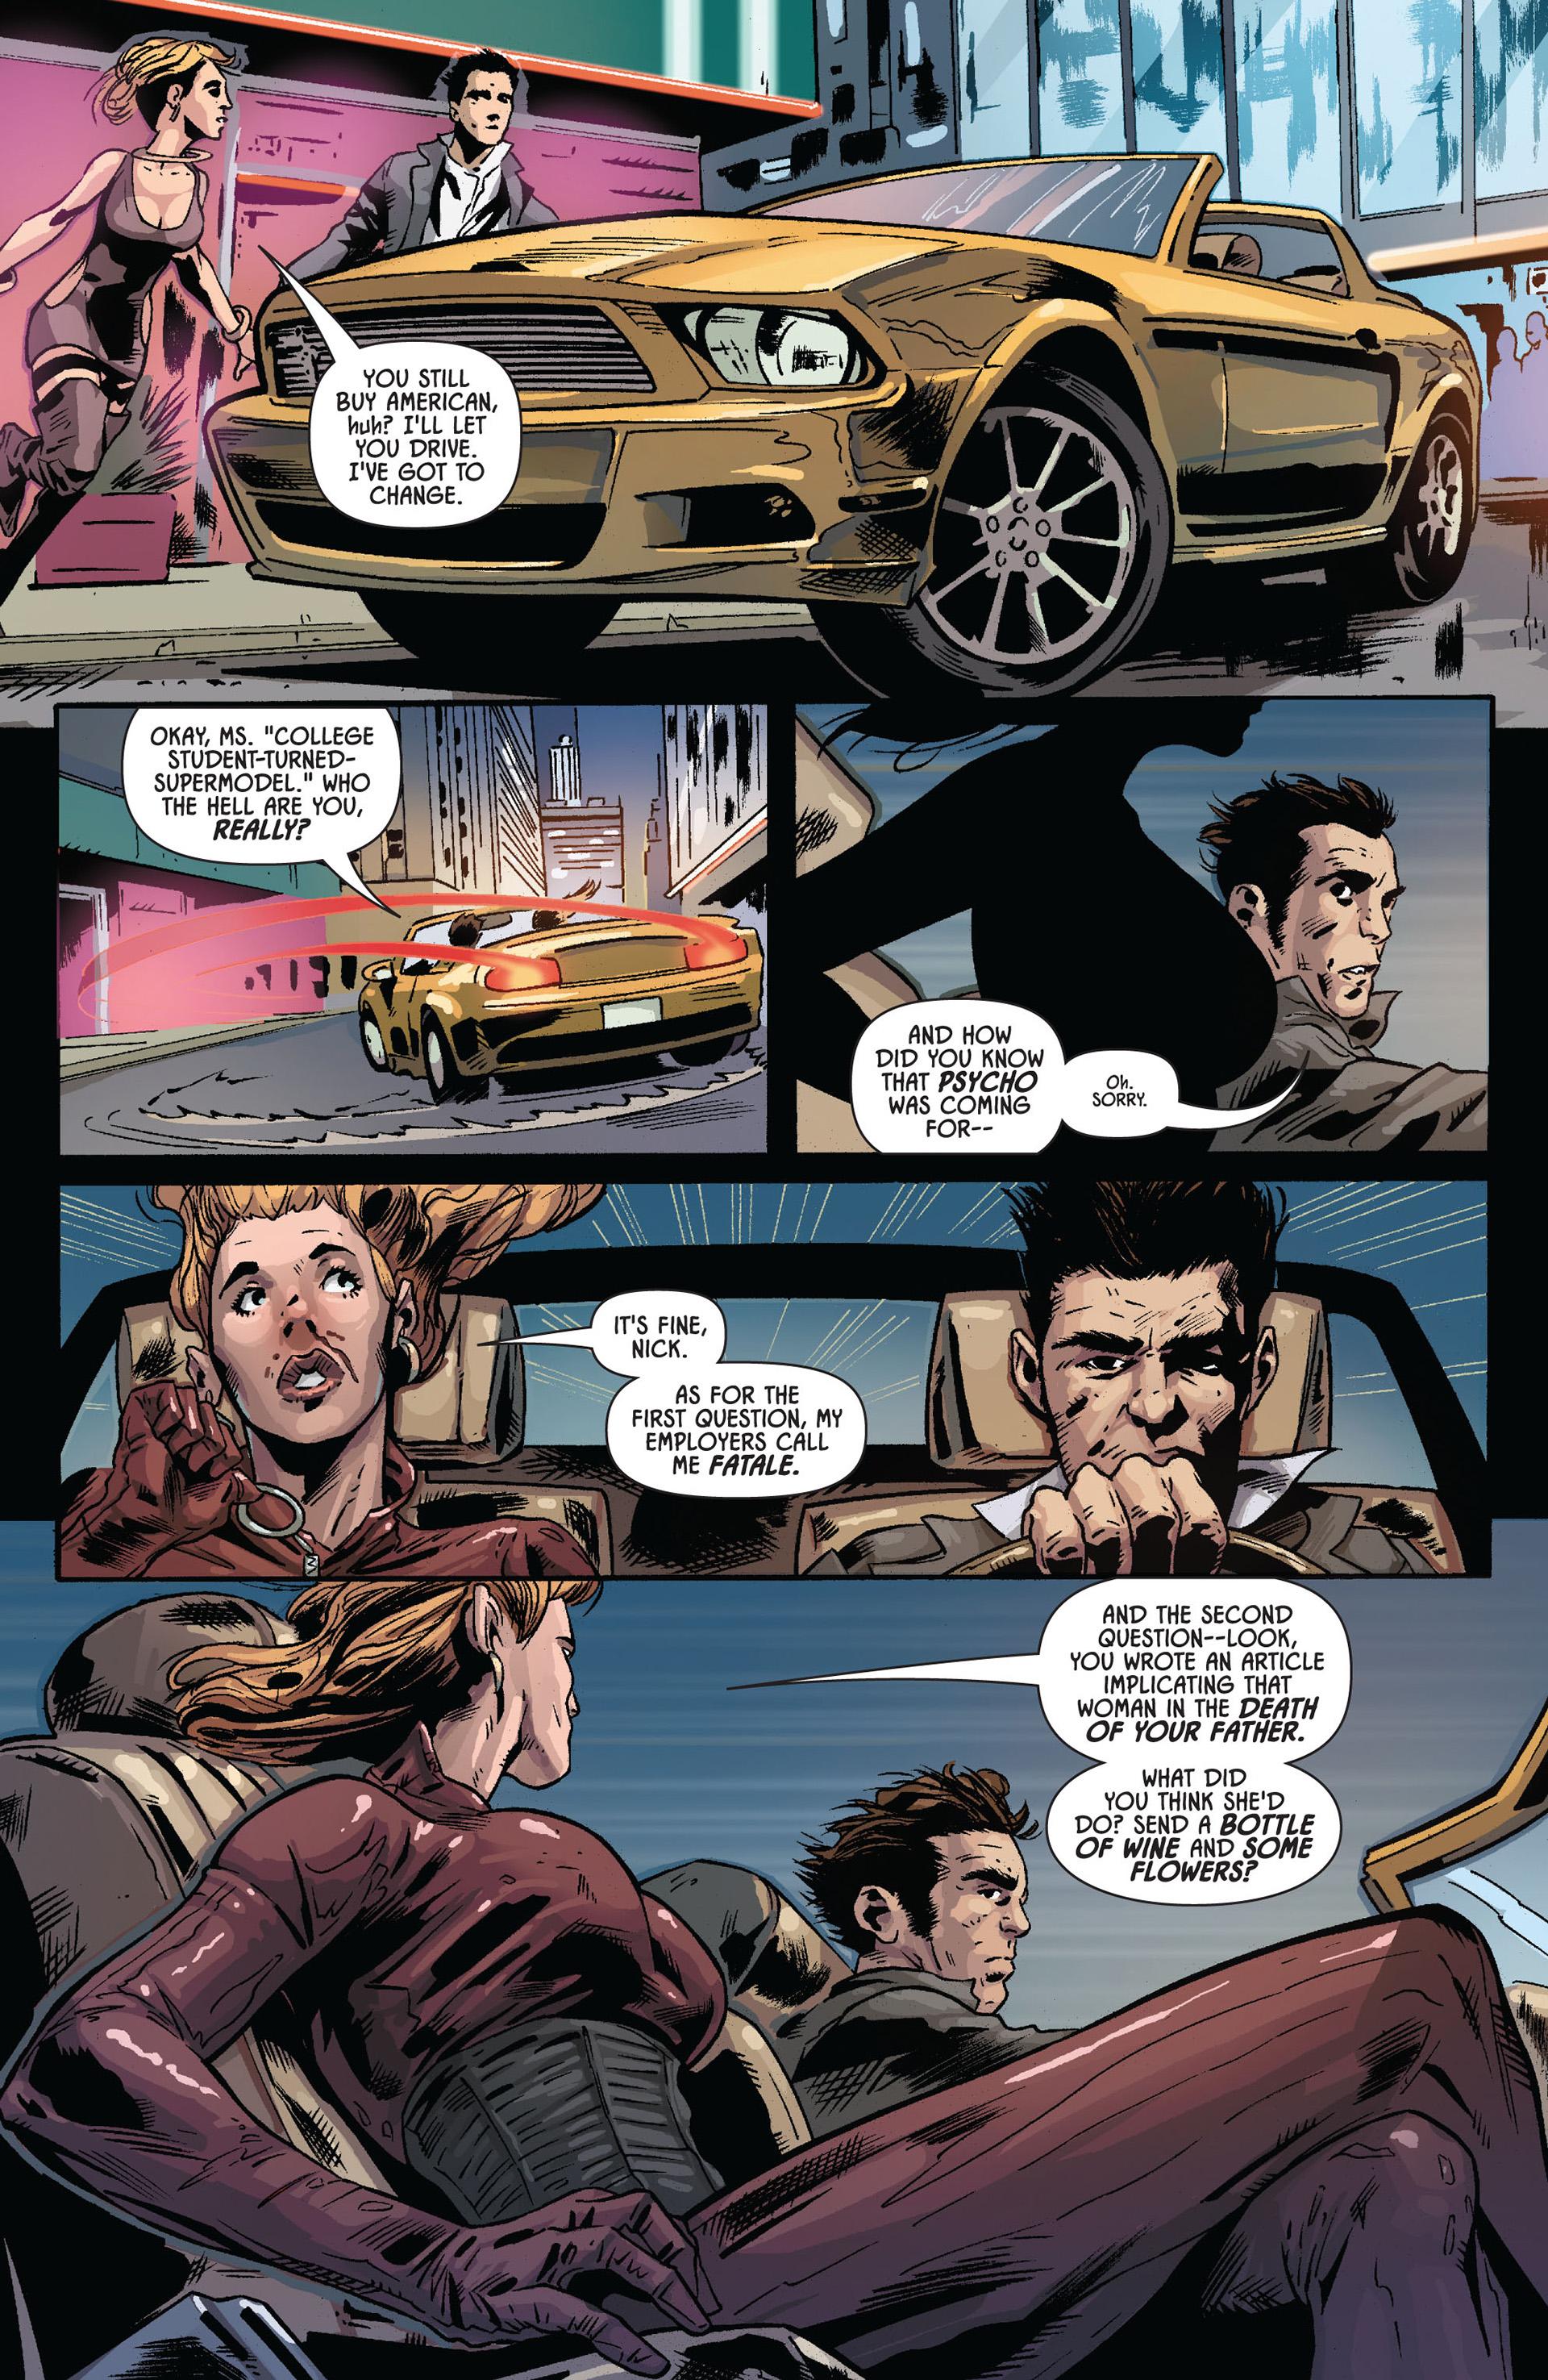 Comic Black Widow 2010 Issue 6